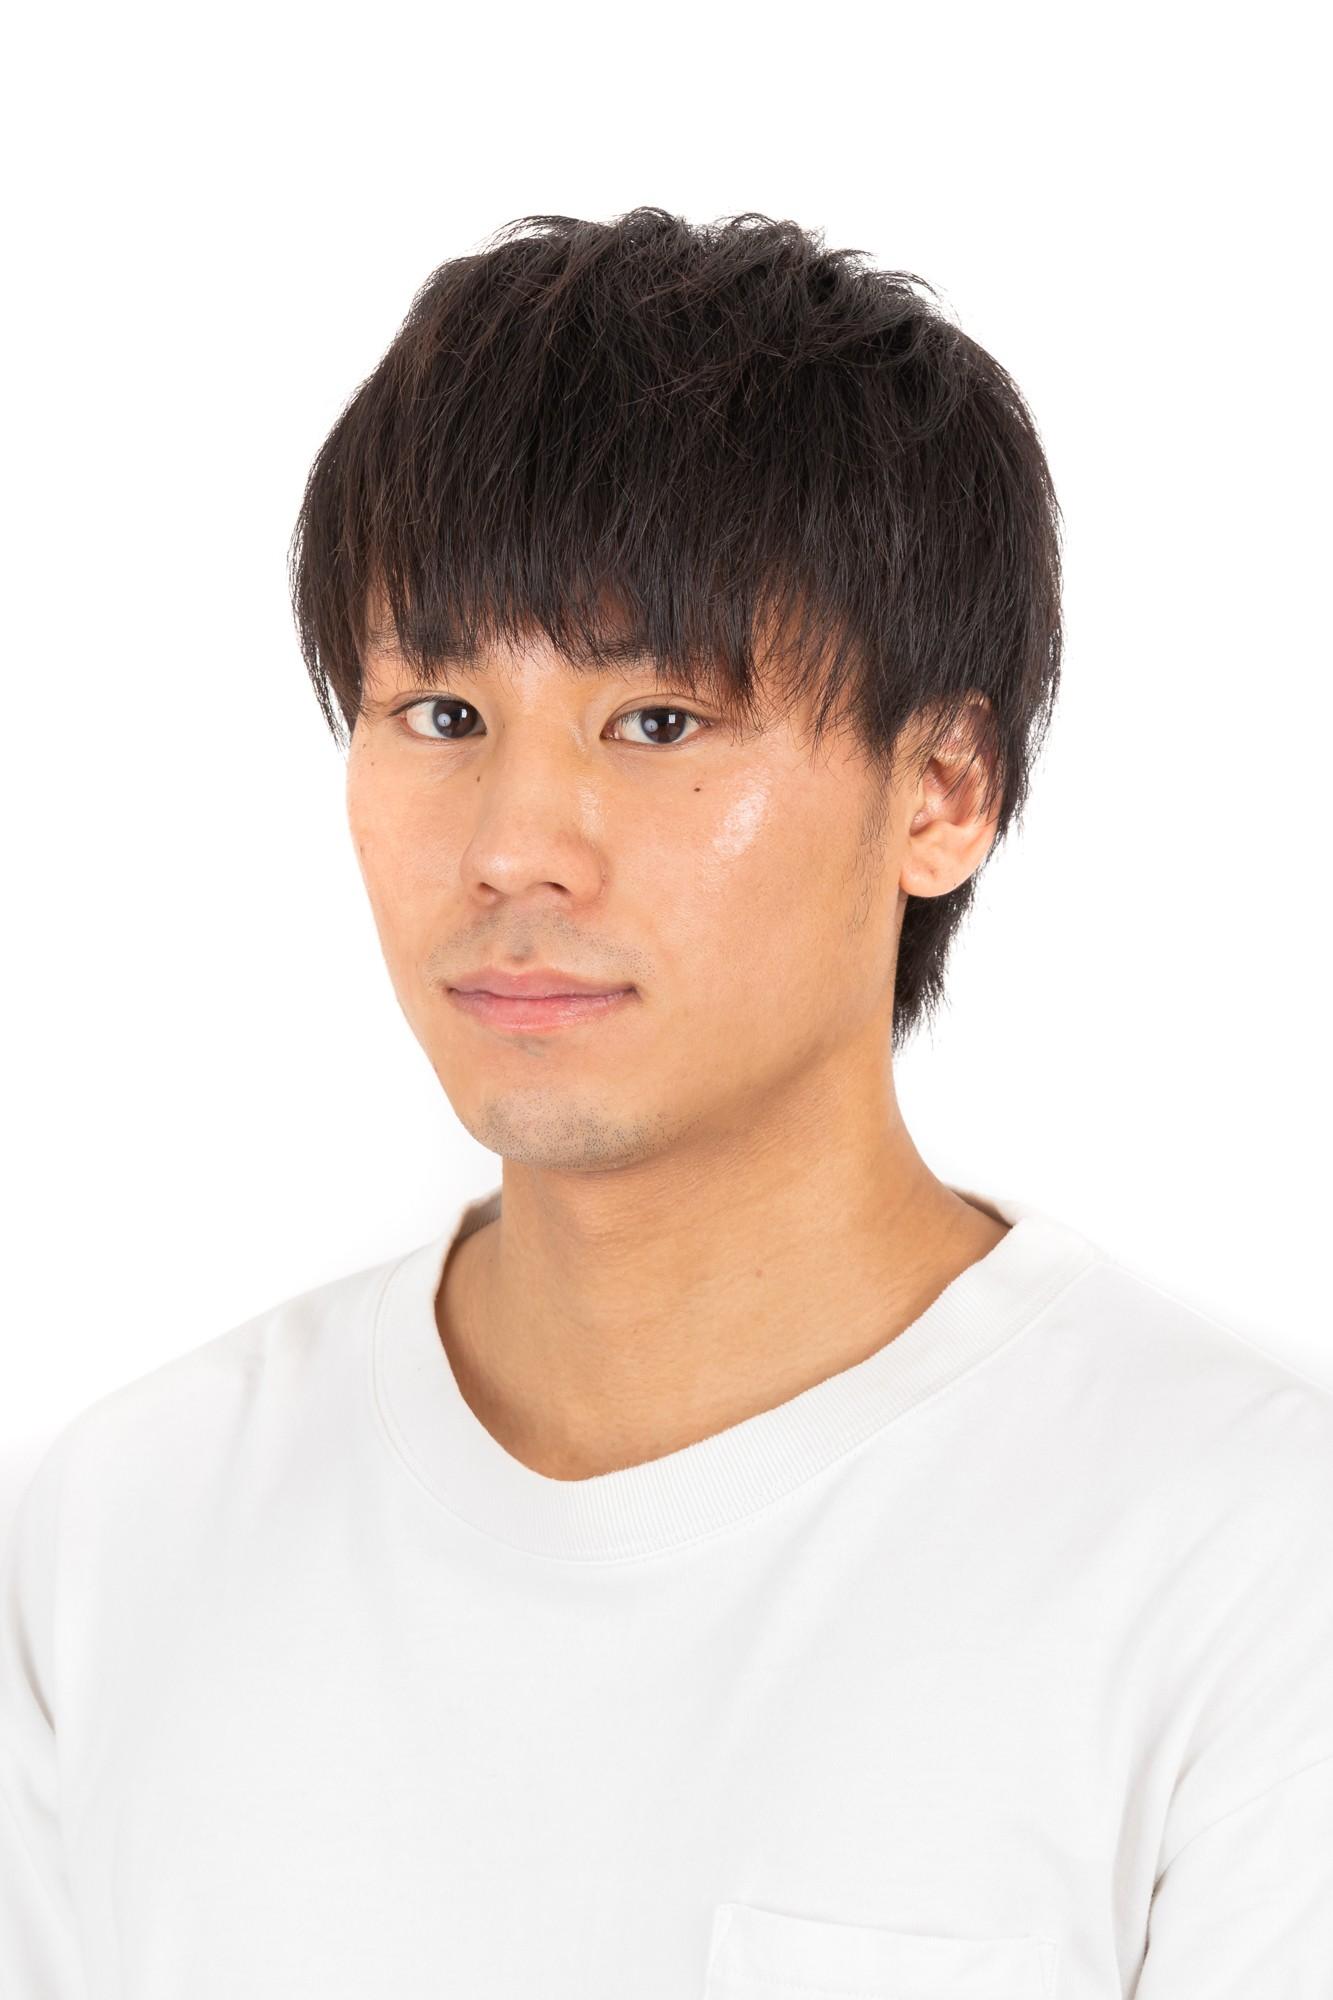 生田和輝,KazukiIkuta